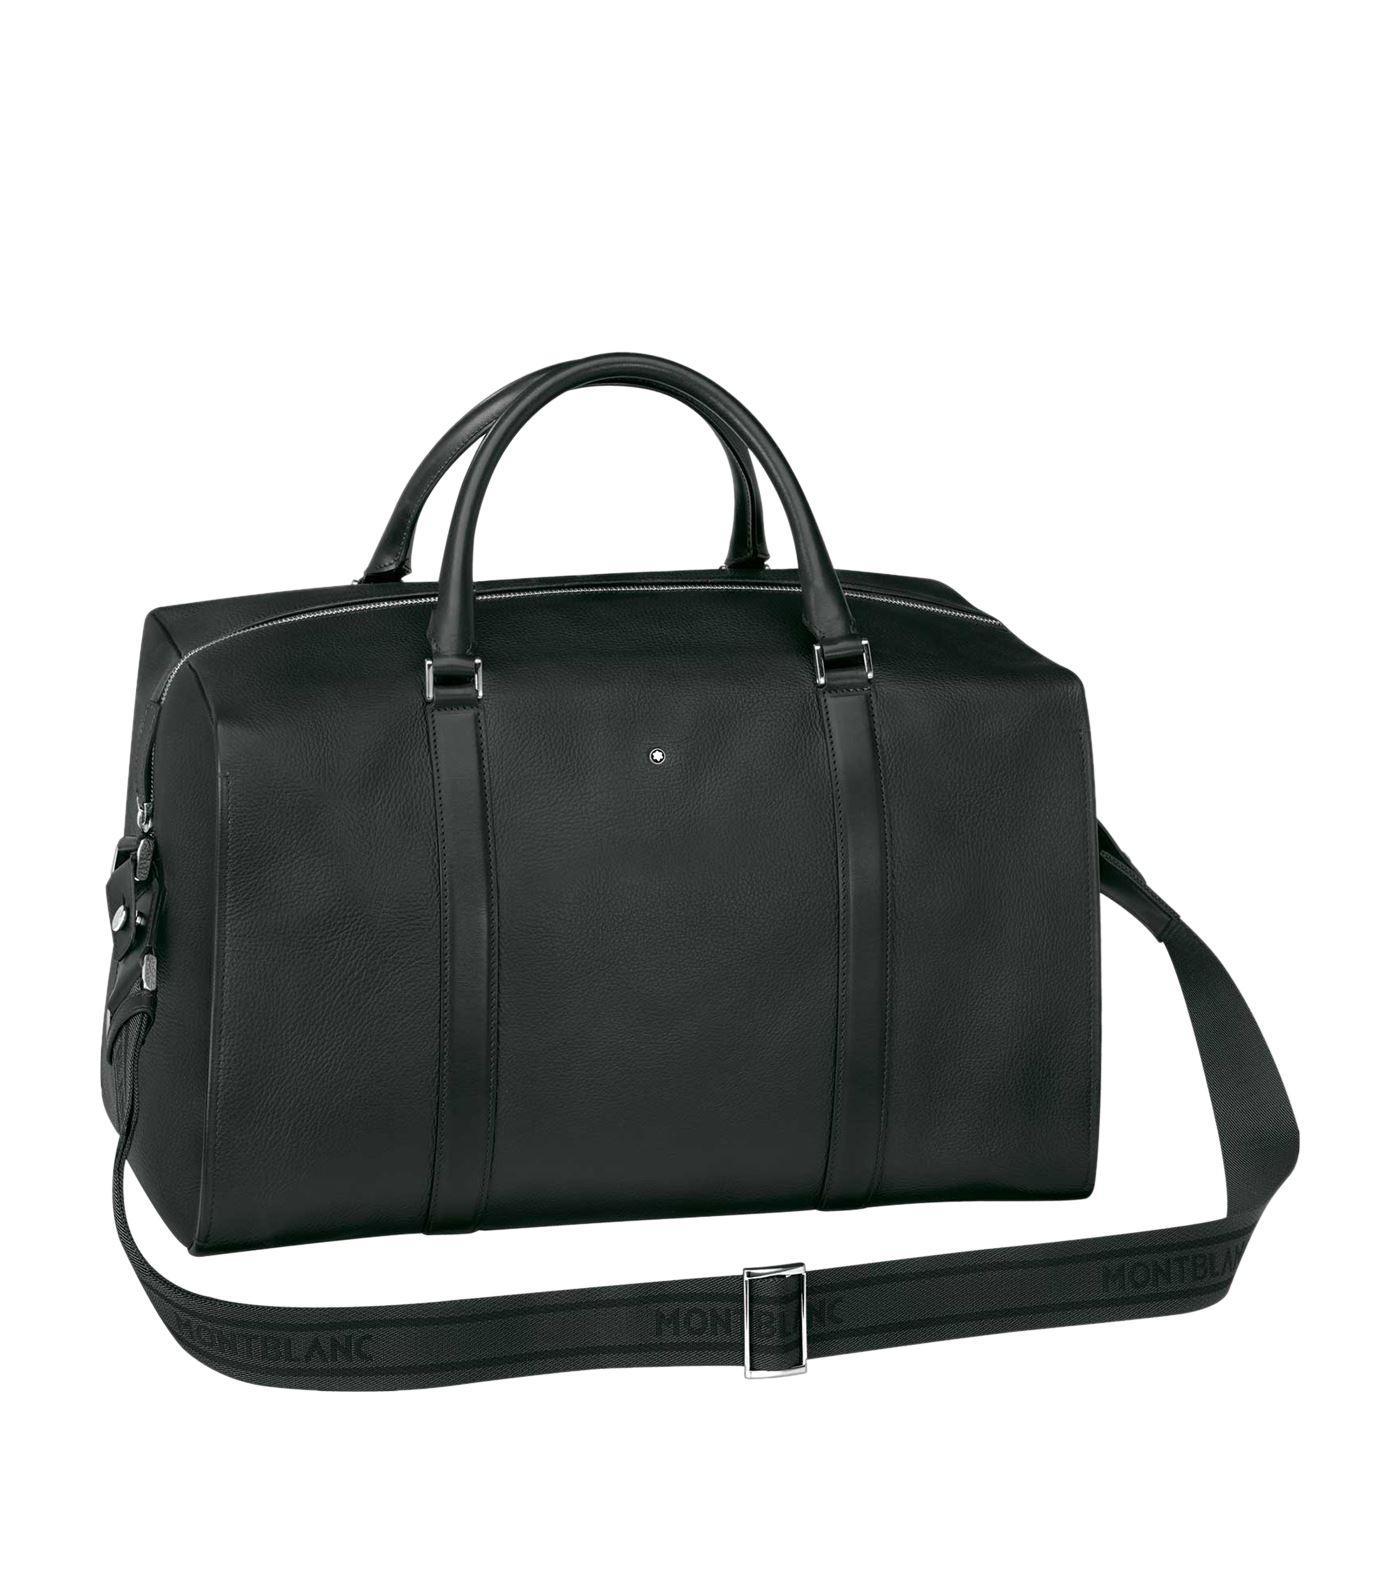 4c03d5de2615 Lyst - Montblanc Meisterstück Soft Grain Duffle Small Black in Black ...